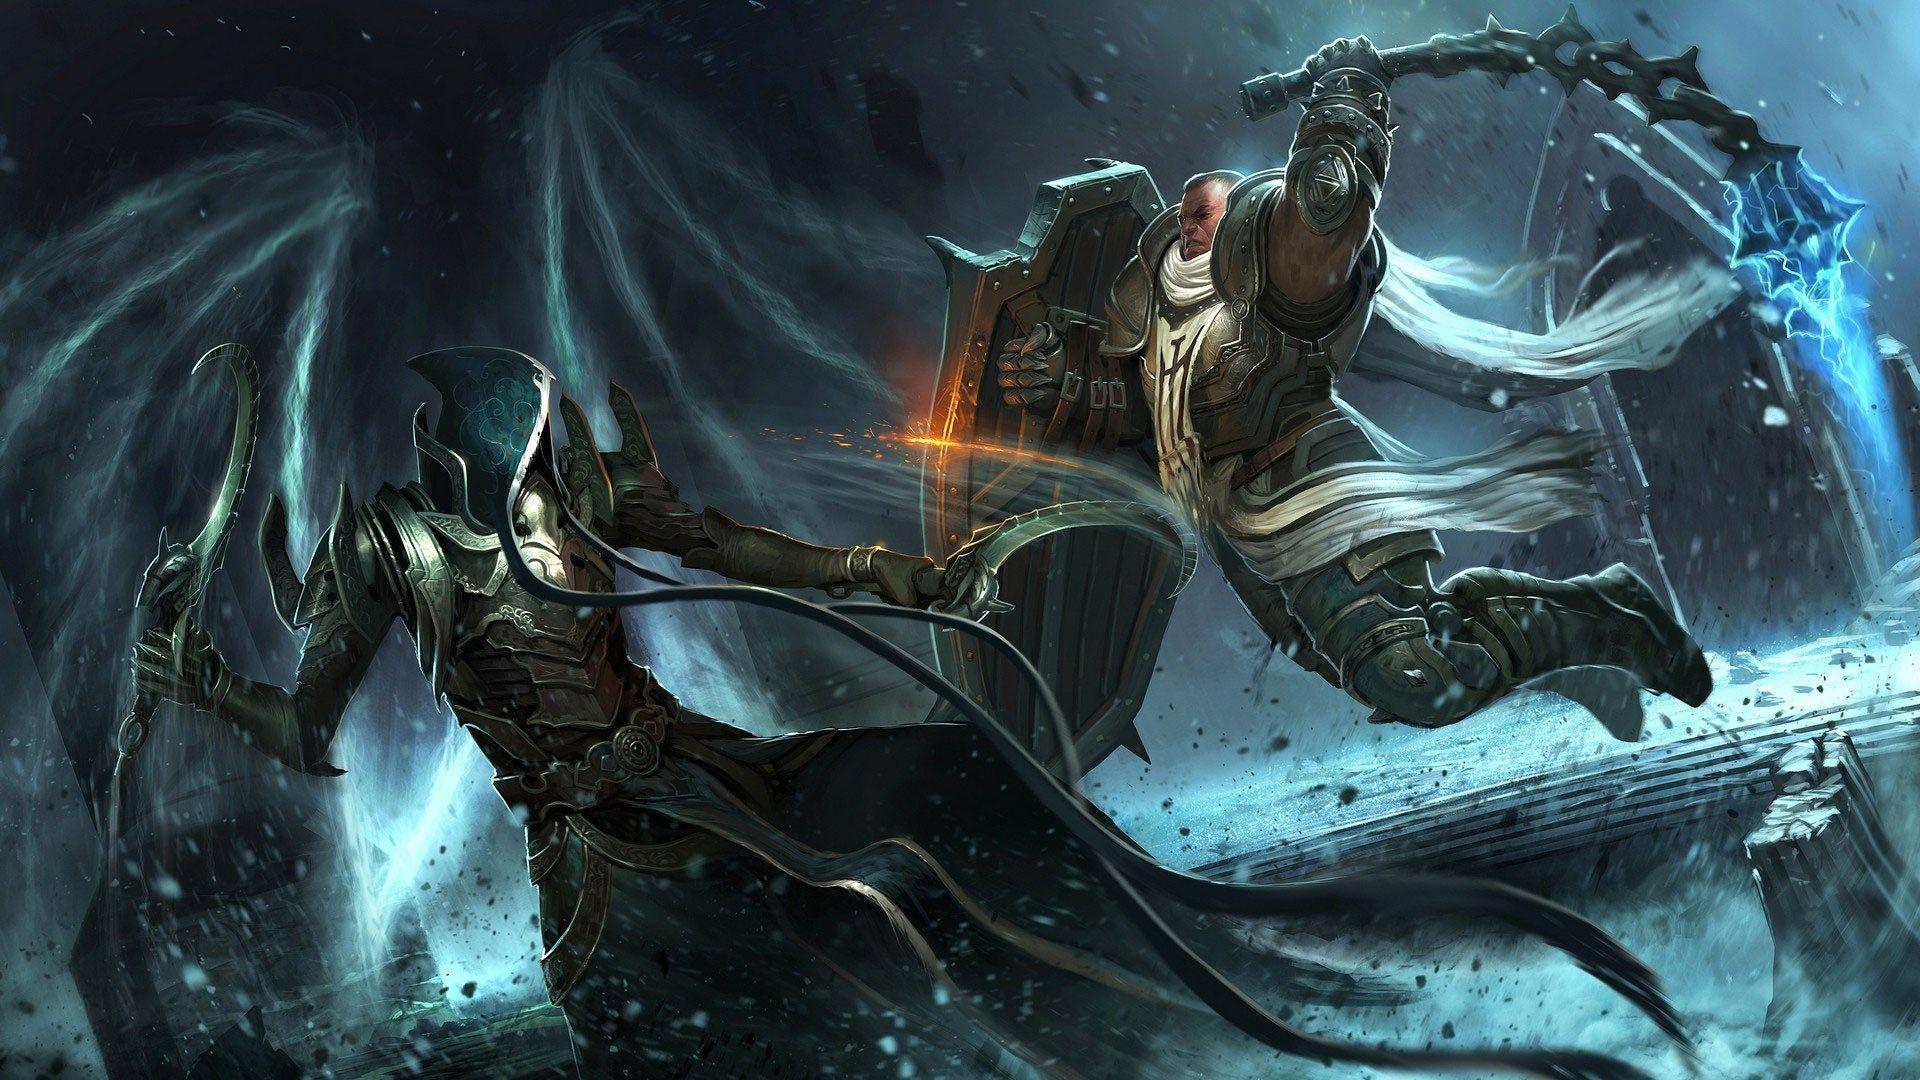 1920x1080 Diablo Iii Reaper Of Souls Game Wallpaper Diablo Art Wallpaper Blizzard Entertainment